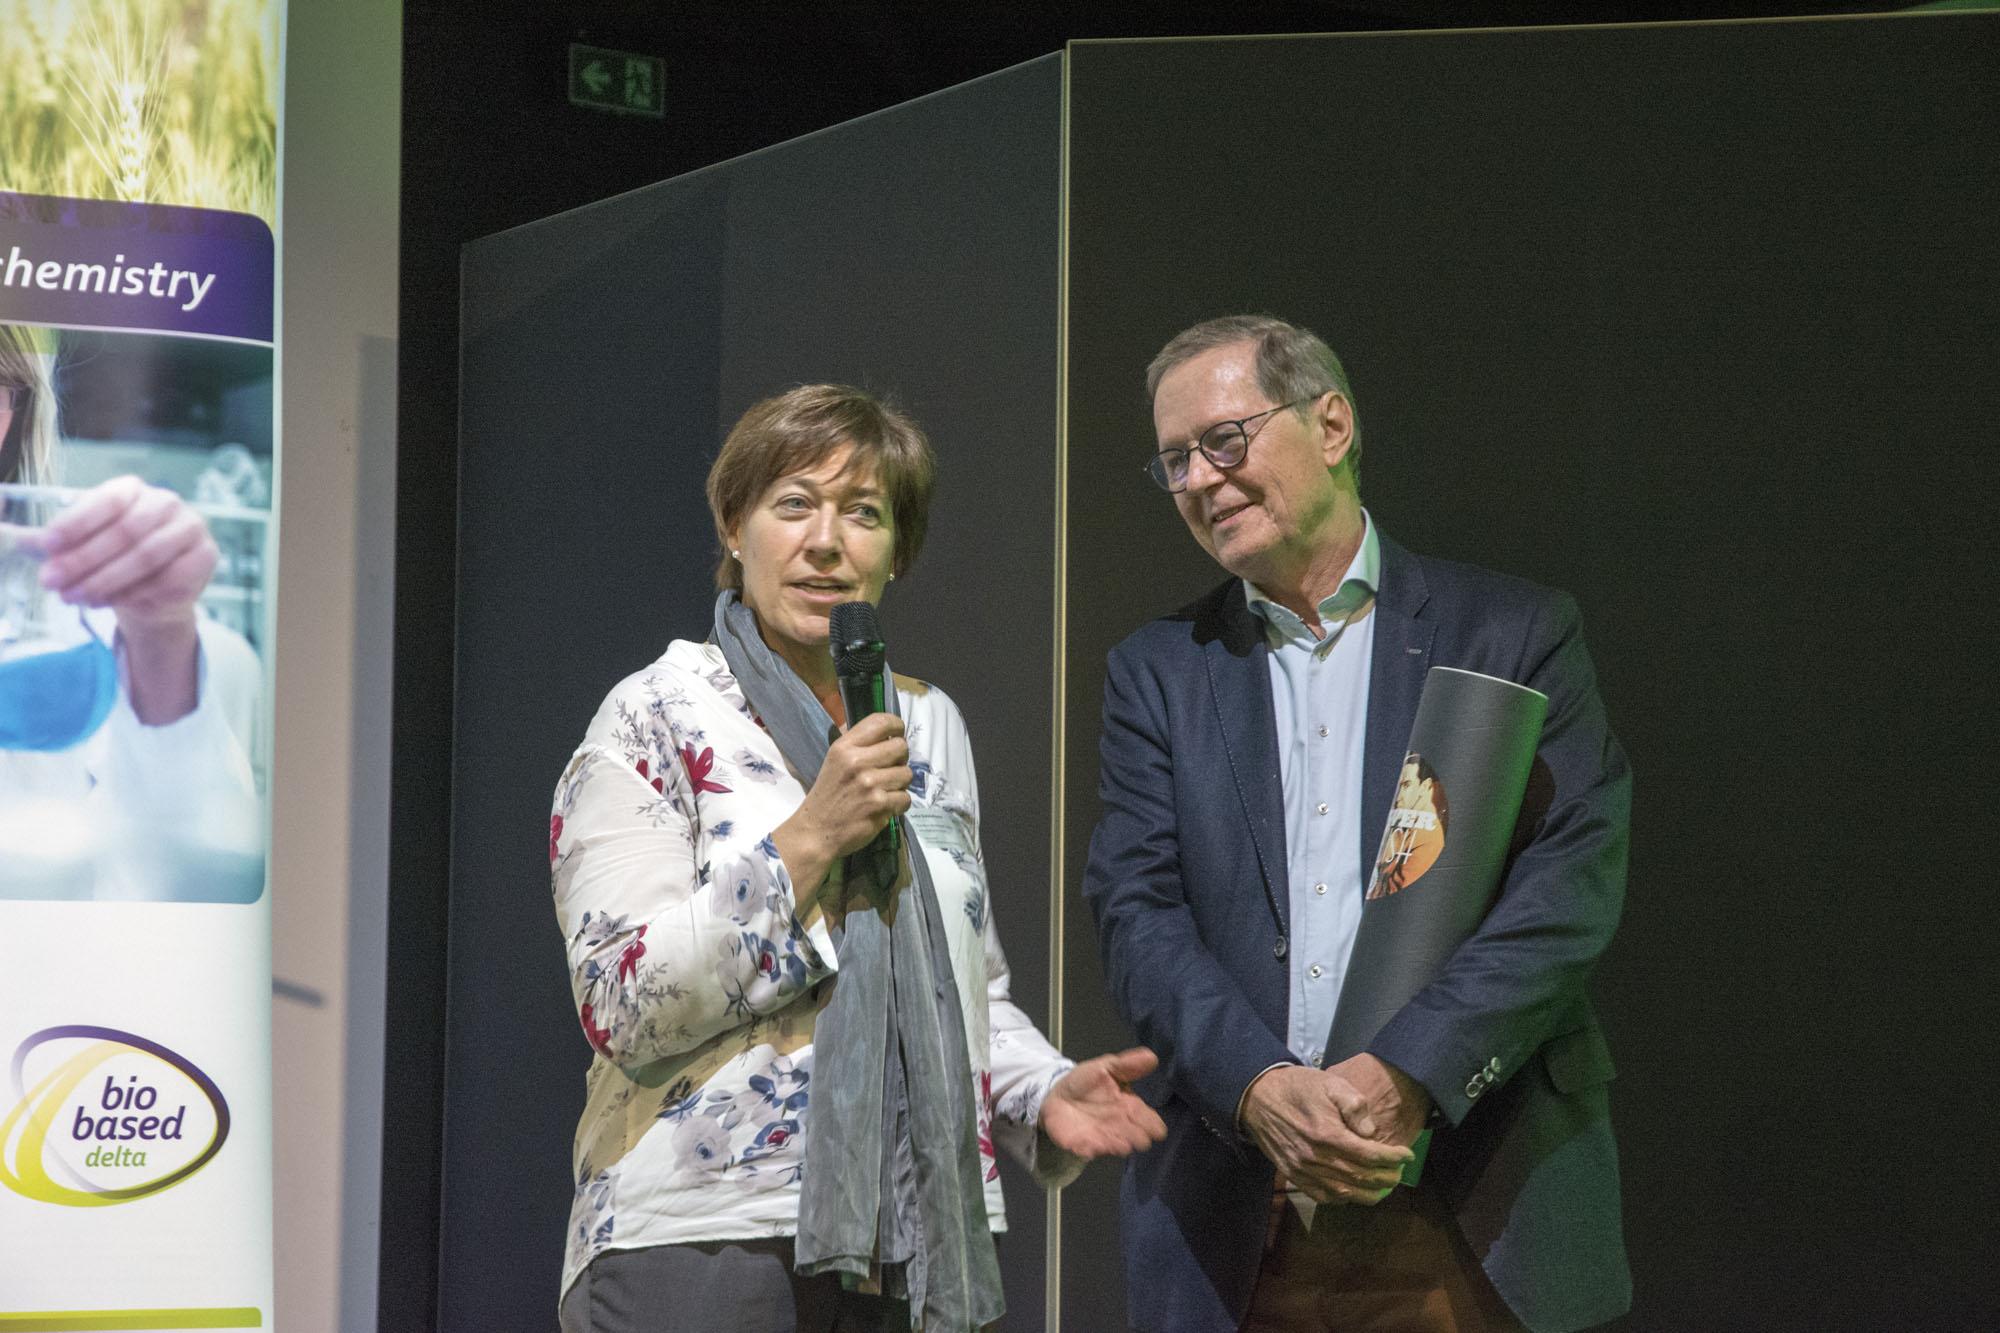 Sofie Dobbelaere and Willem Sederel